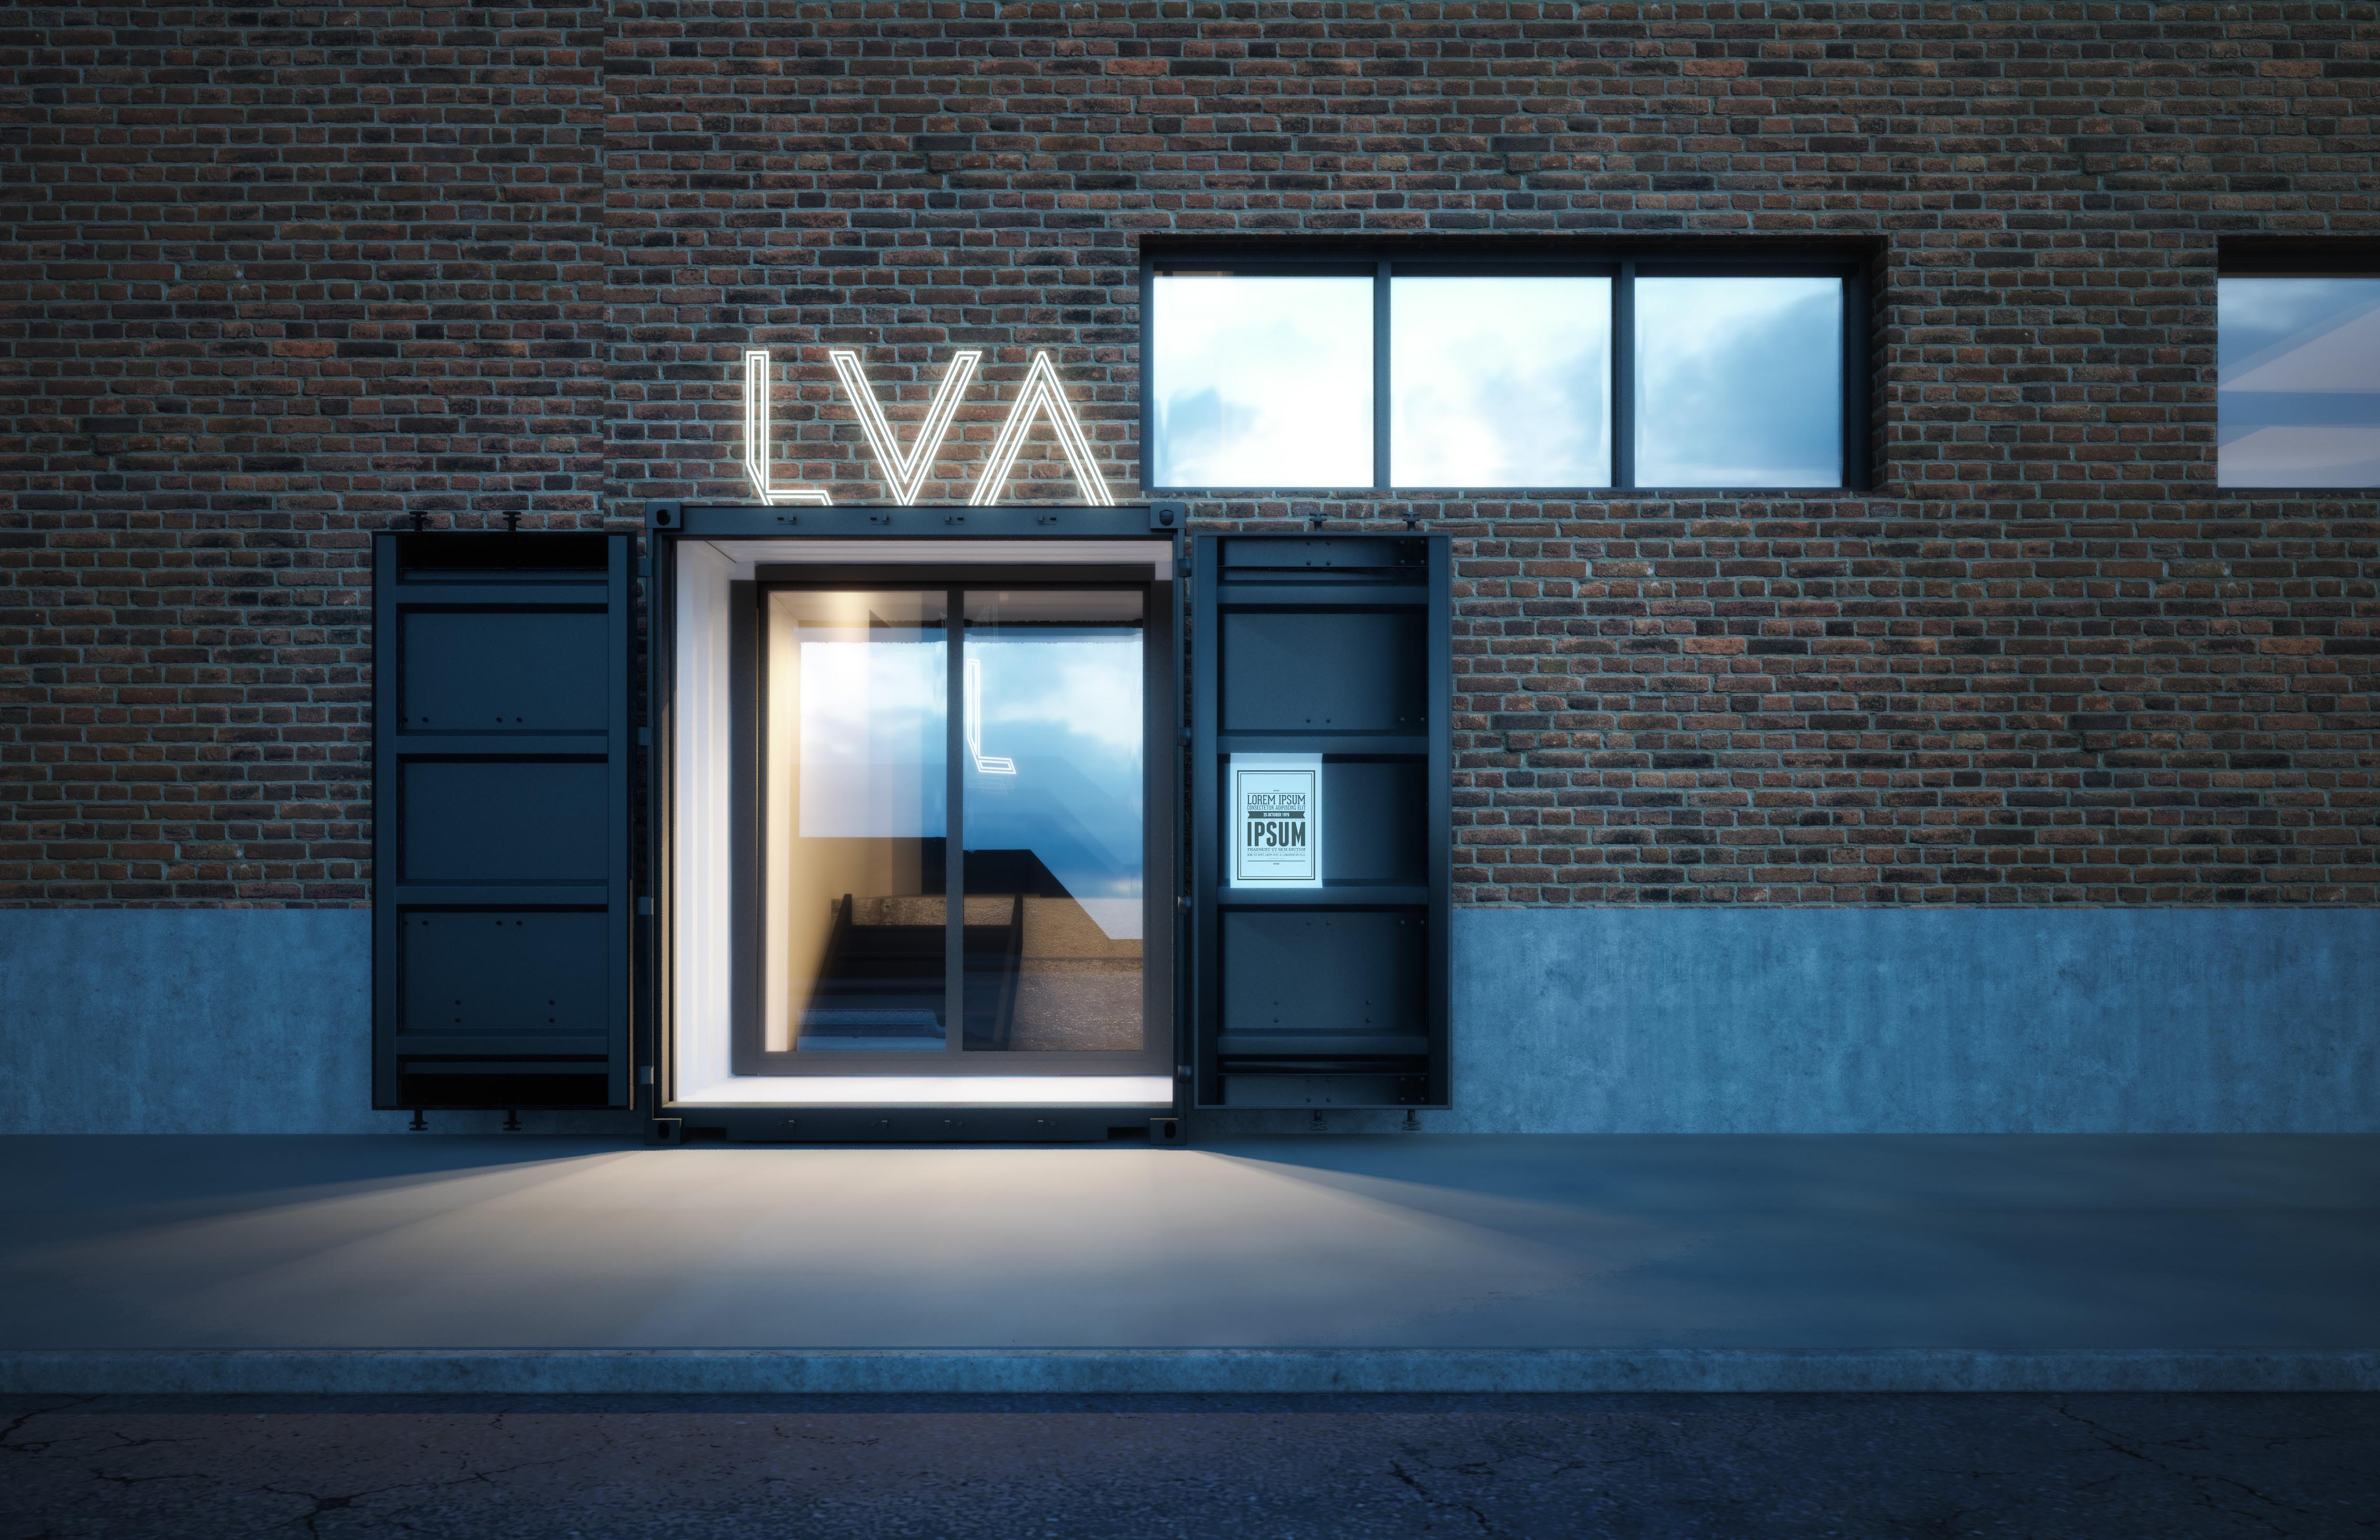 louisville-visual-arts-exterior-sidedoor